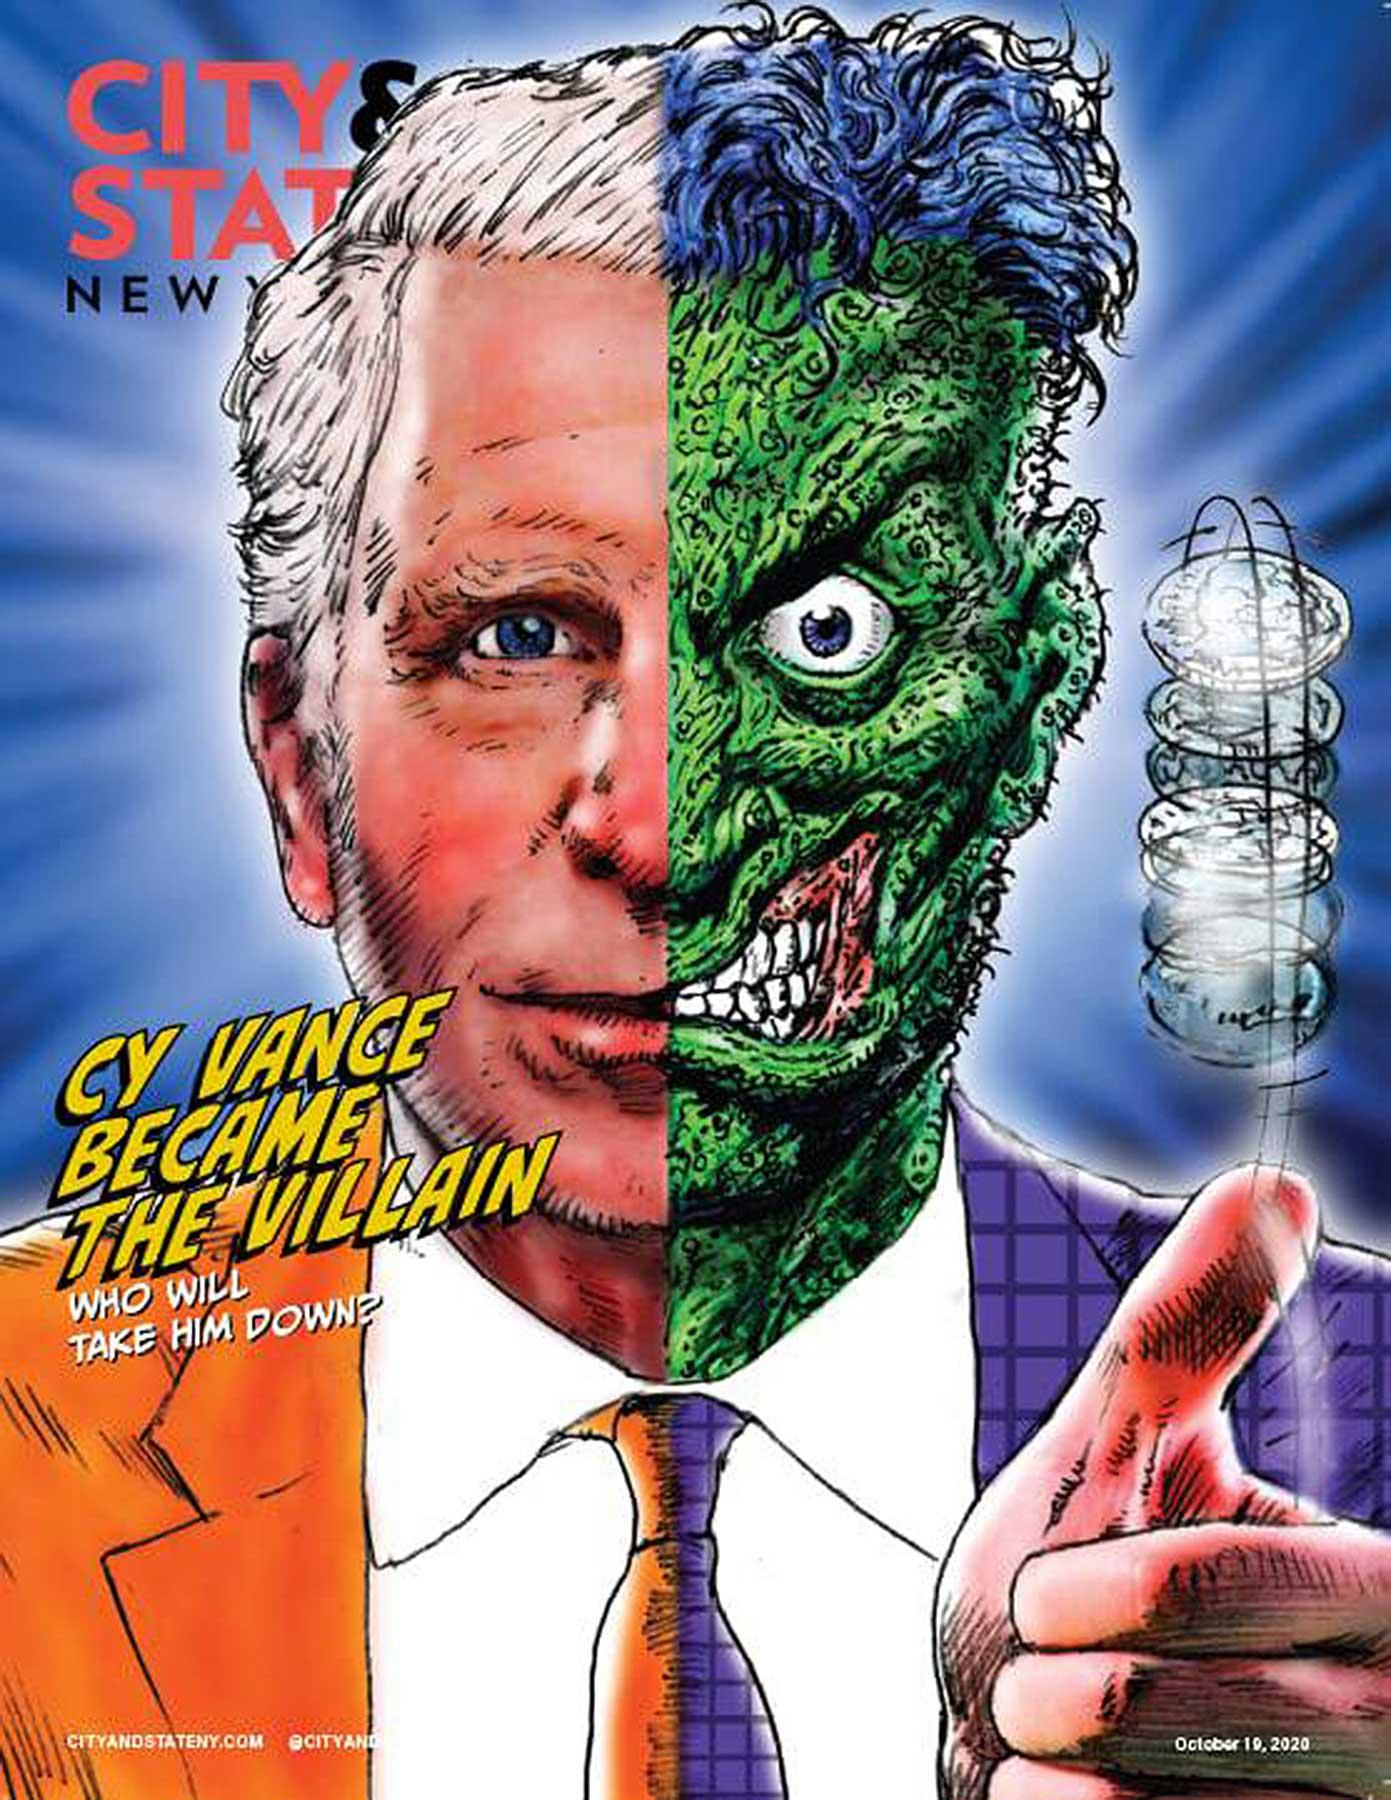 Arlen Schumer / City & State Magazine Cover / Andrew Horton, AD